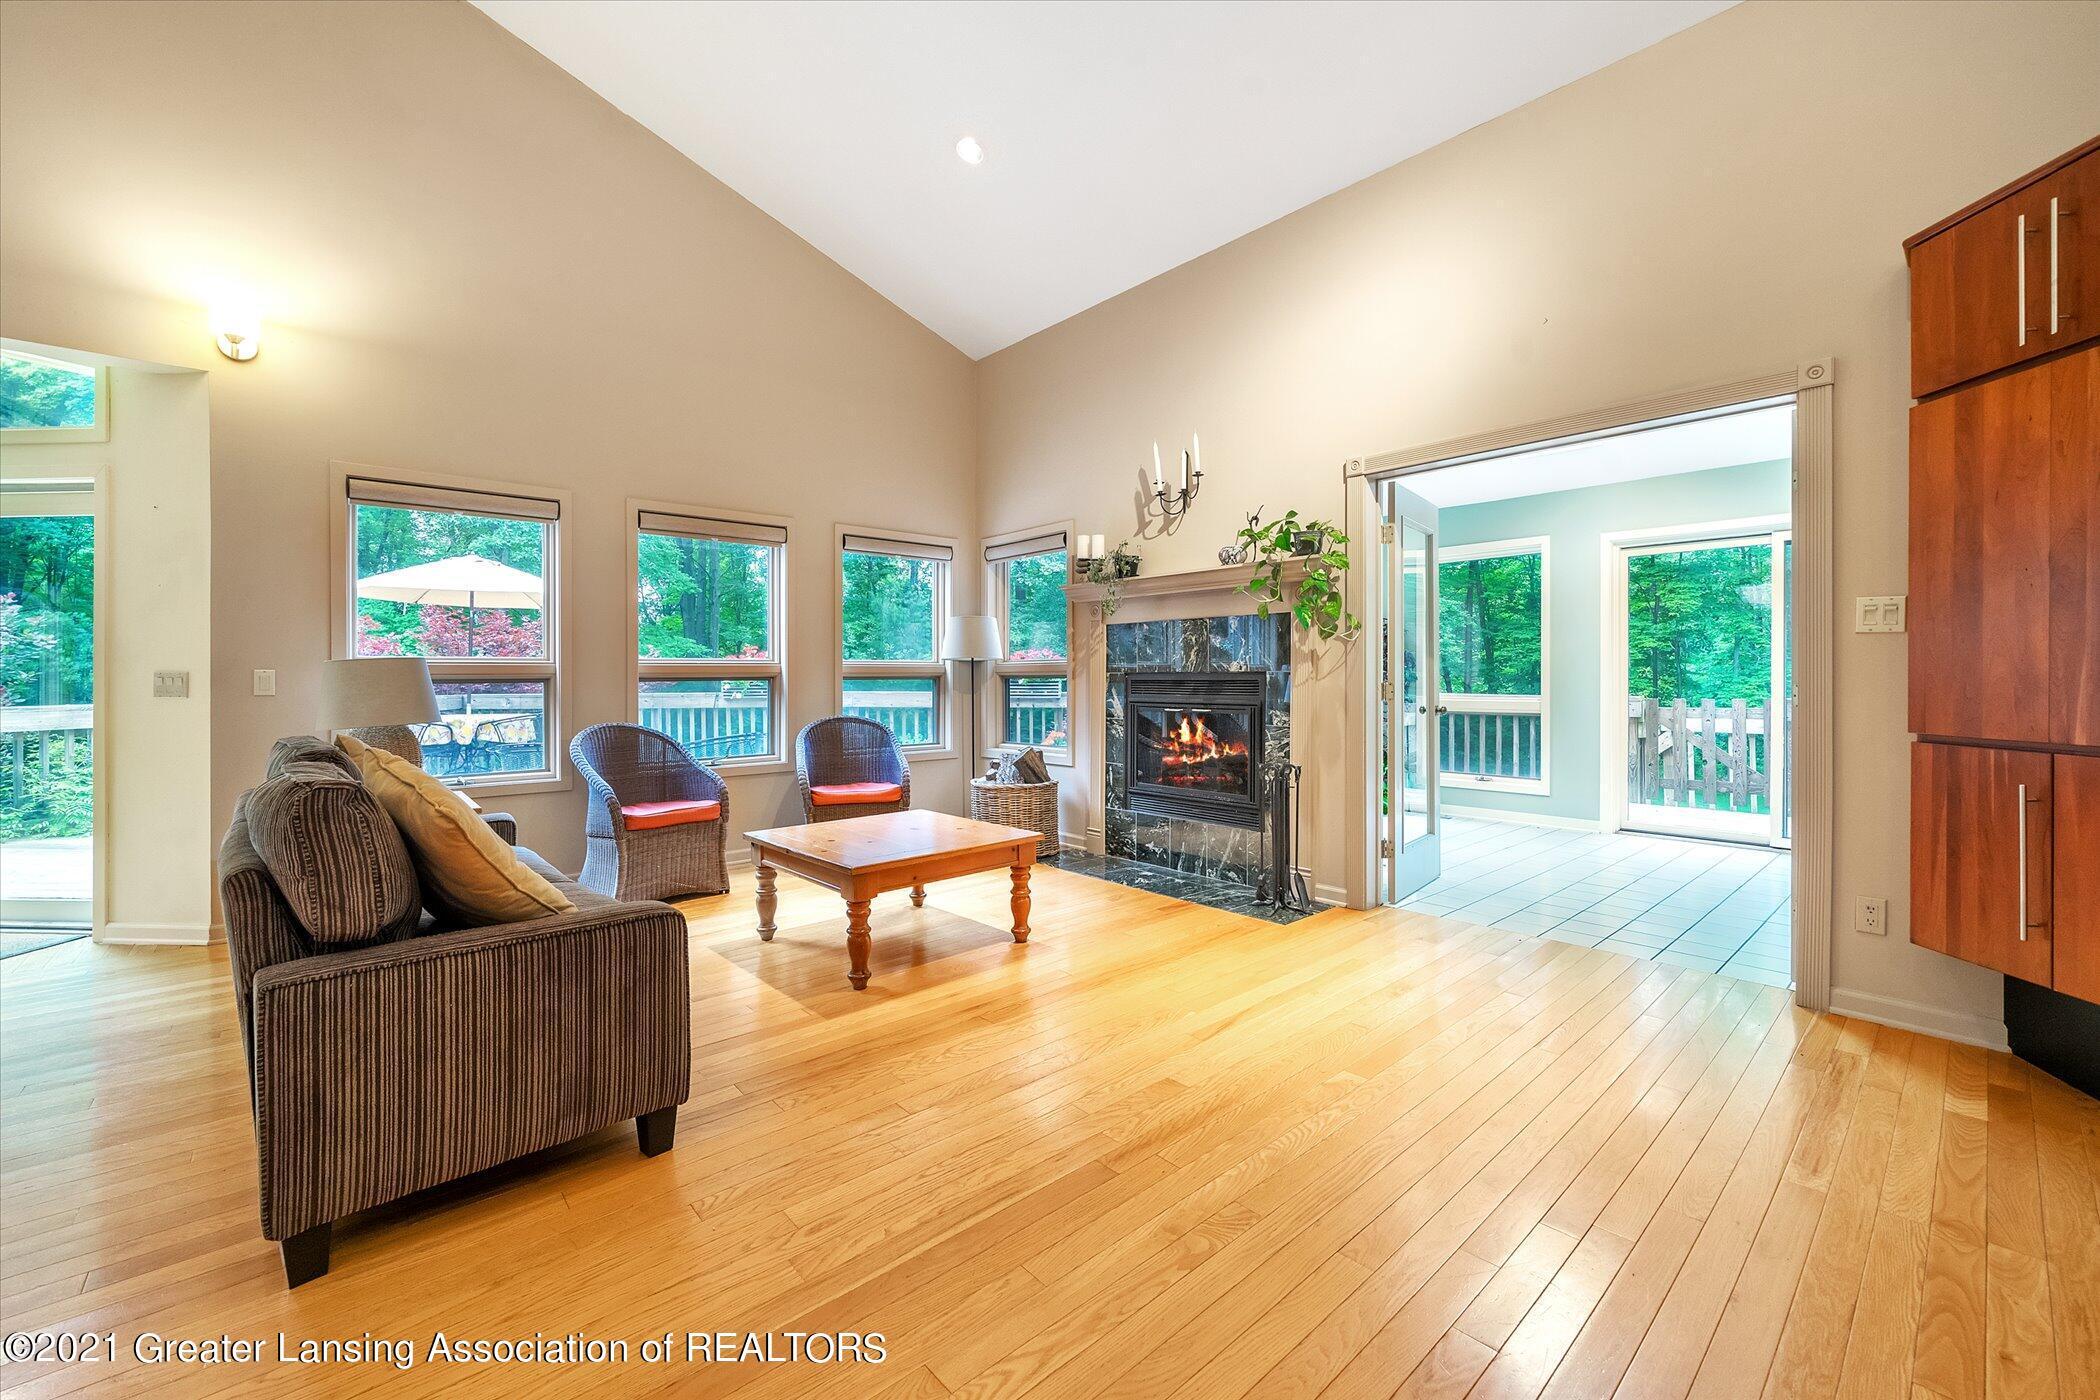 442 Shoesmith Rd - (9) MAIN FLOOR Living Room - 10